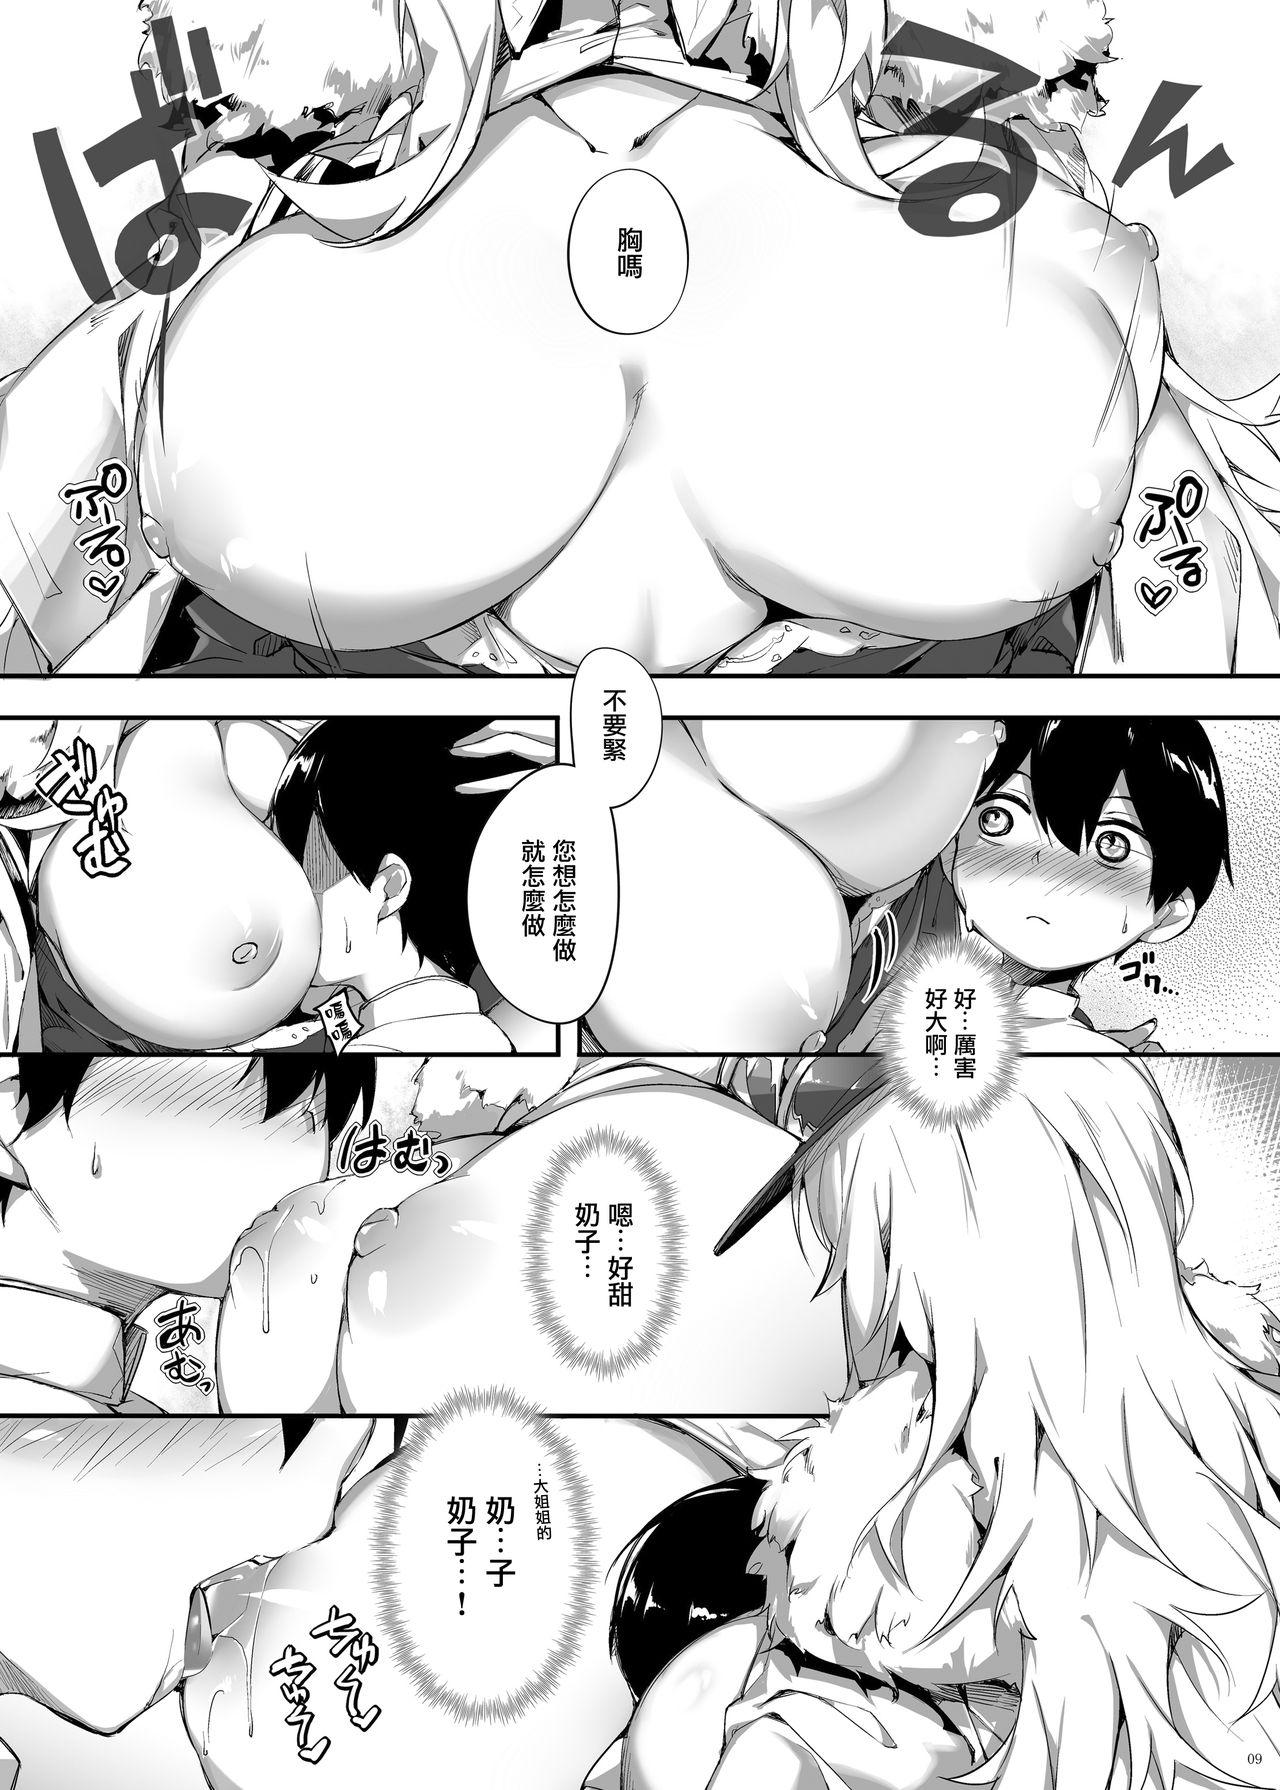 Zeppelin no Shota Aiyoku Hogo 9